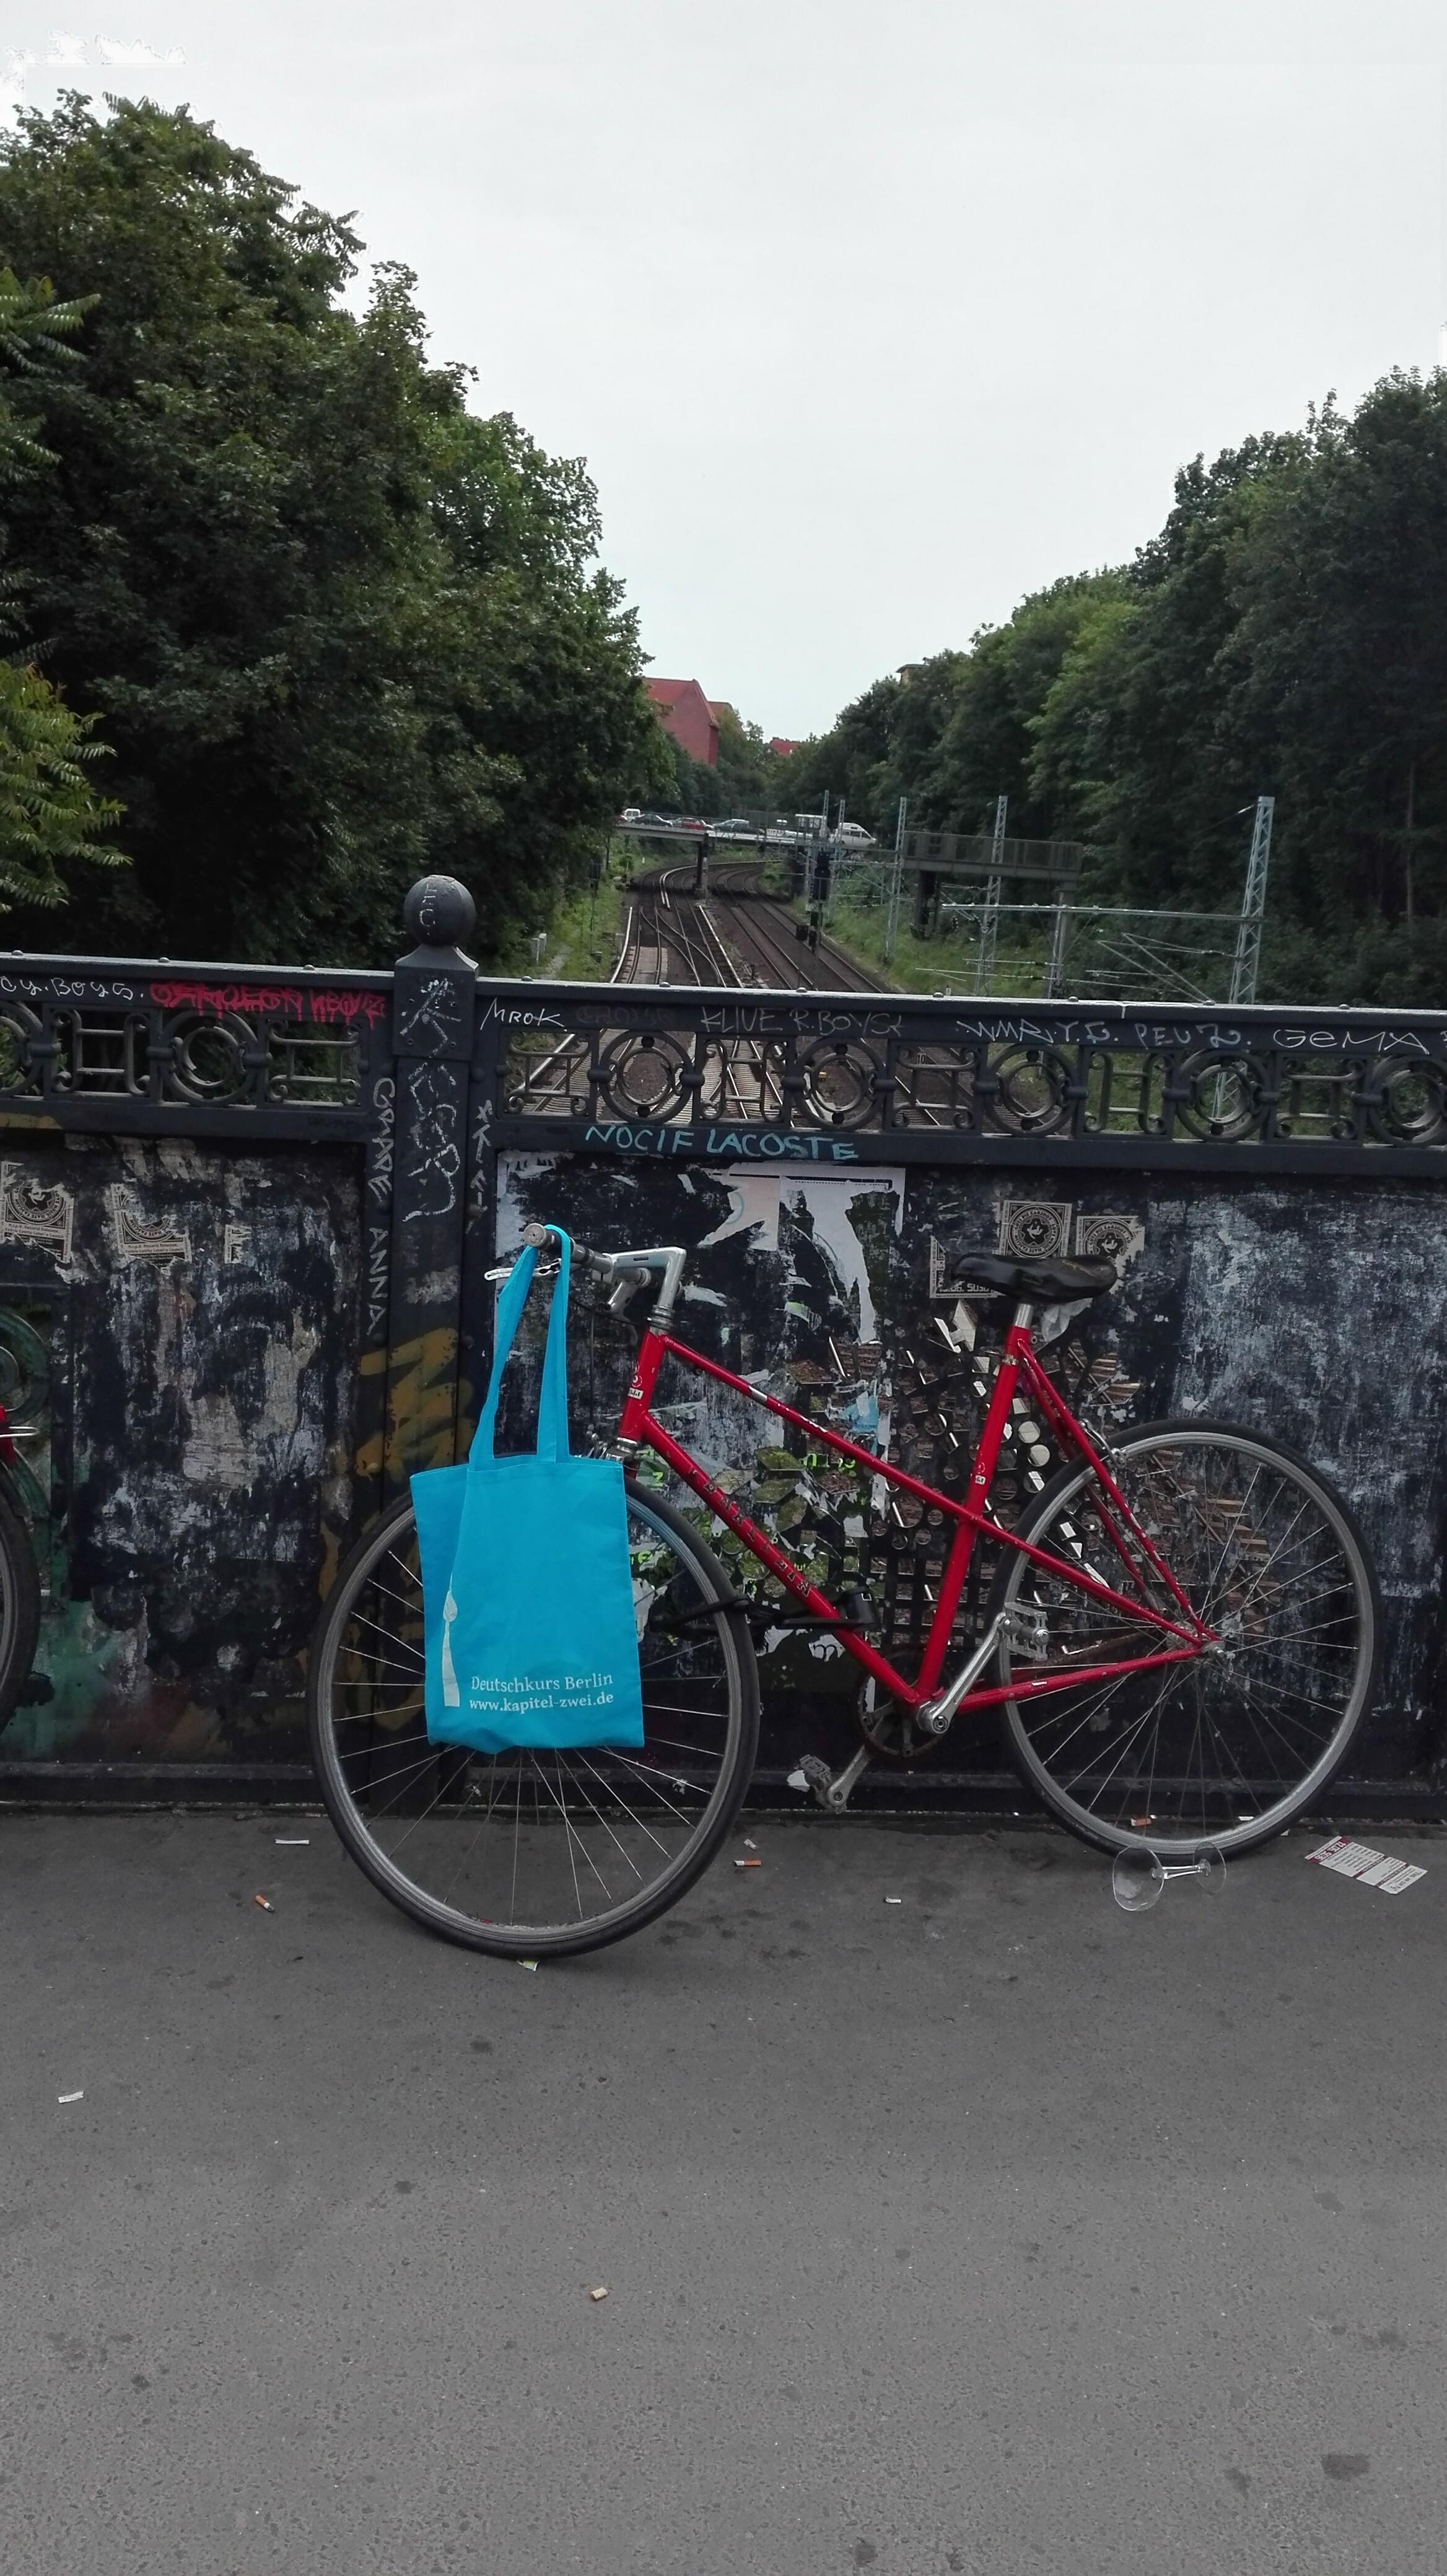 Kapitel Zwei Berlín döner kebap